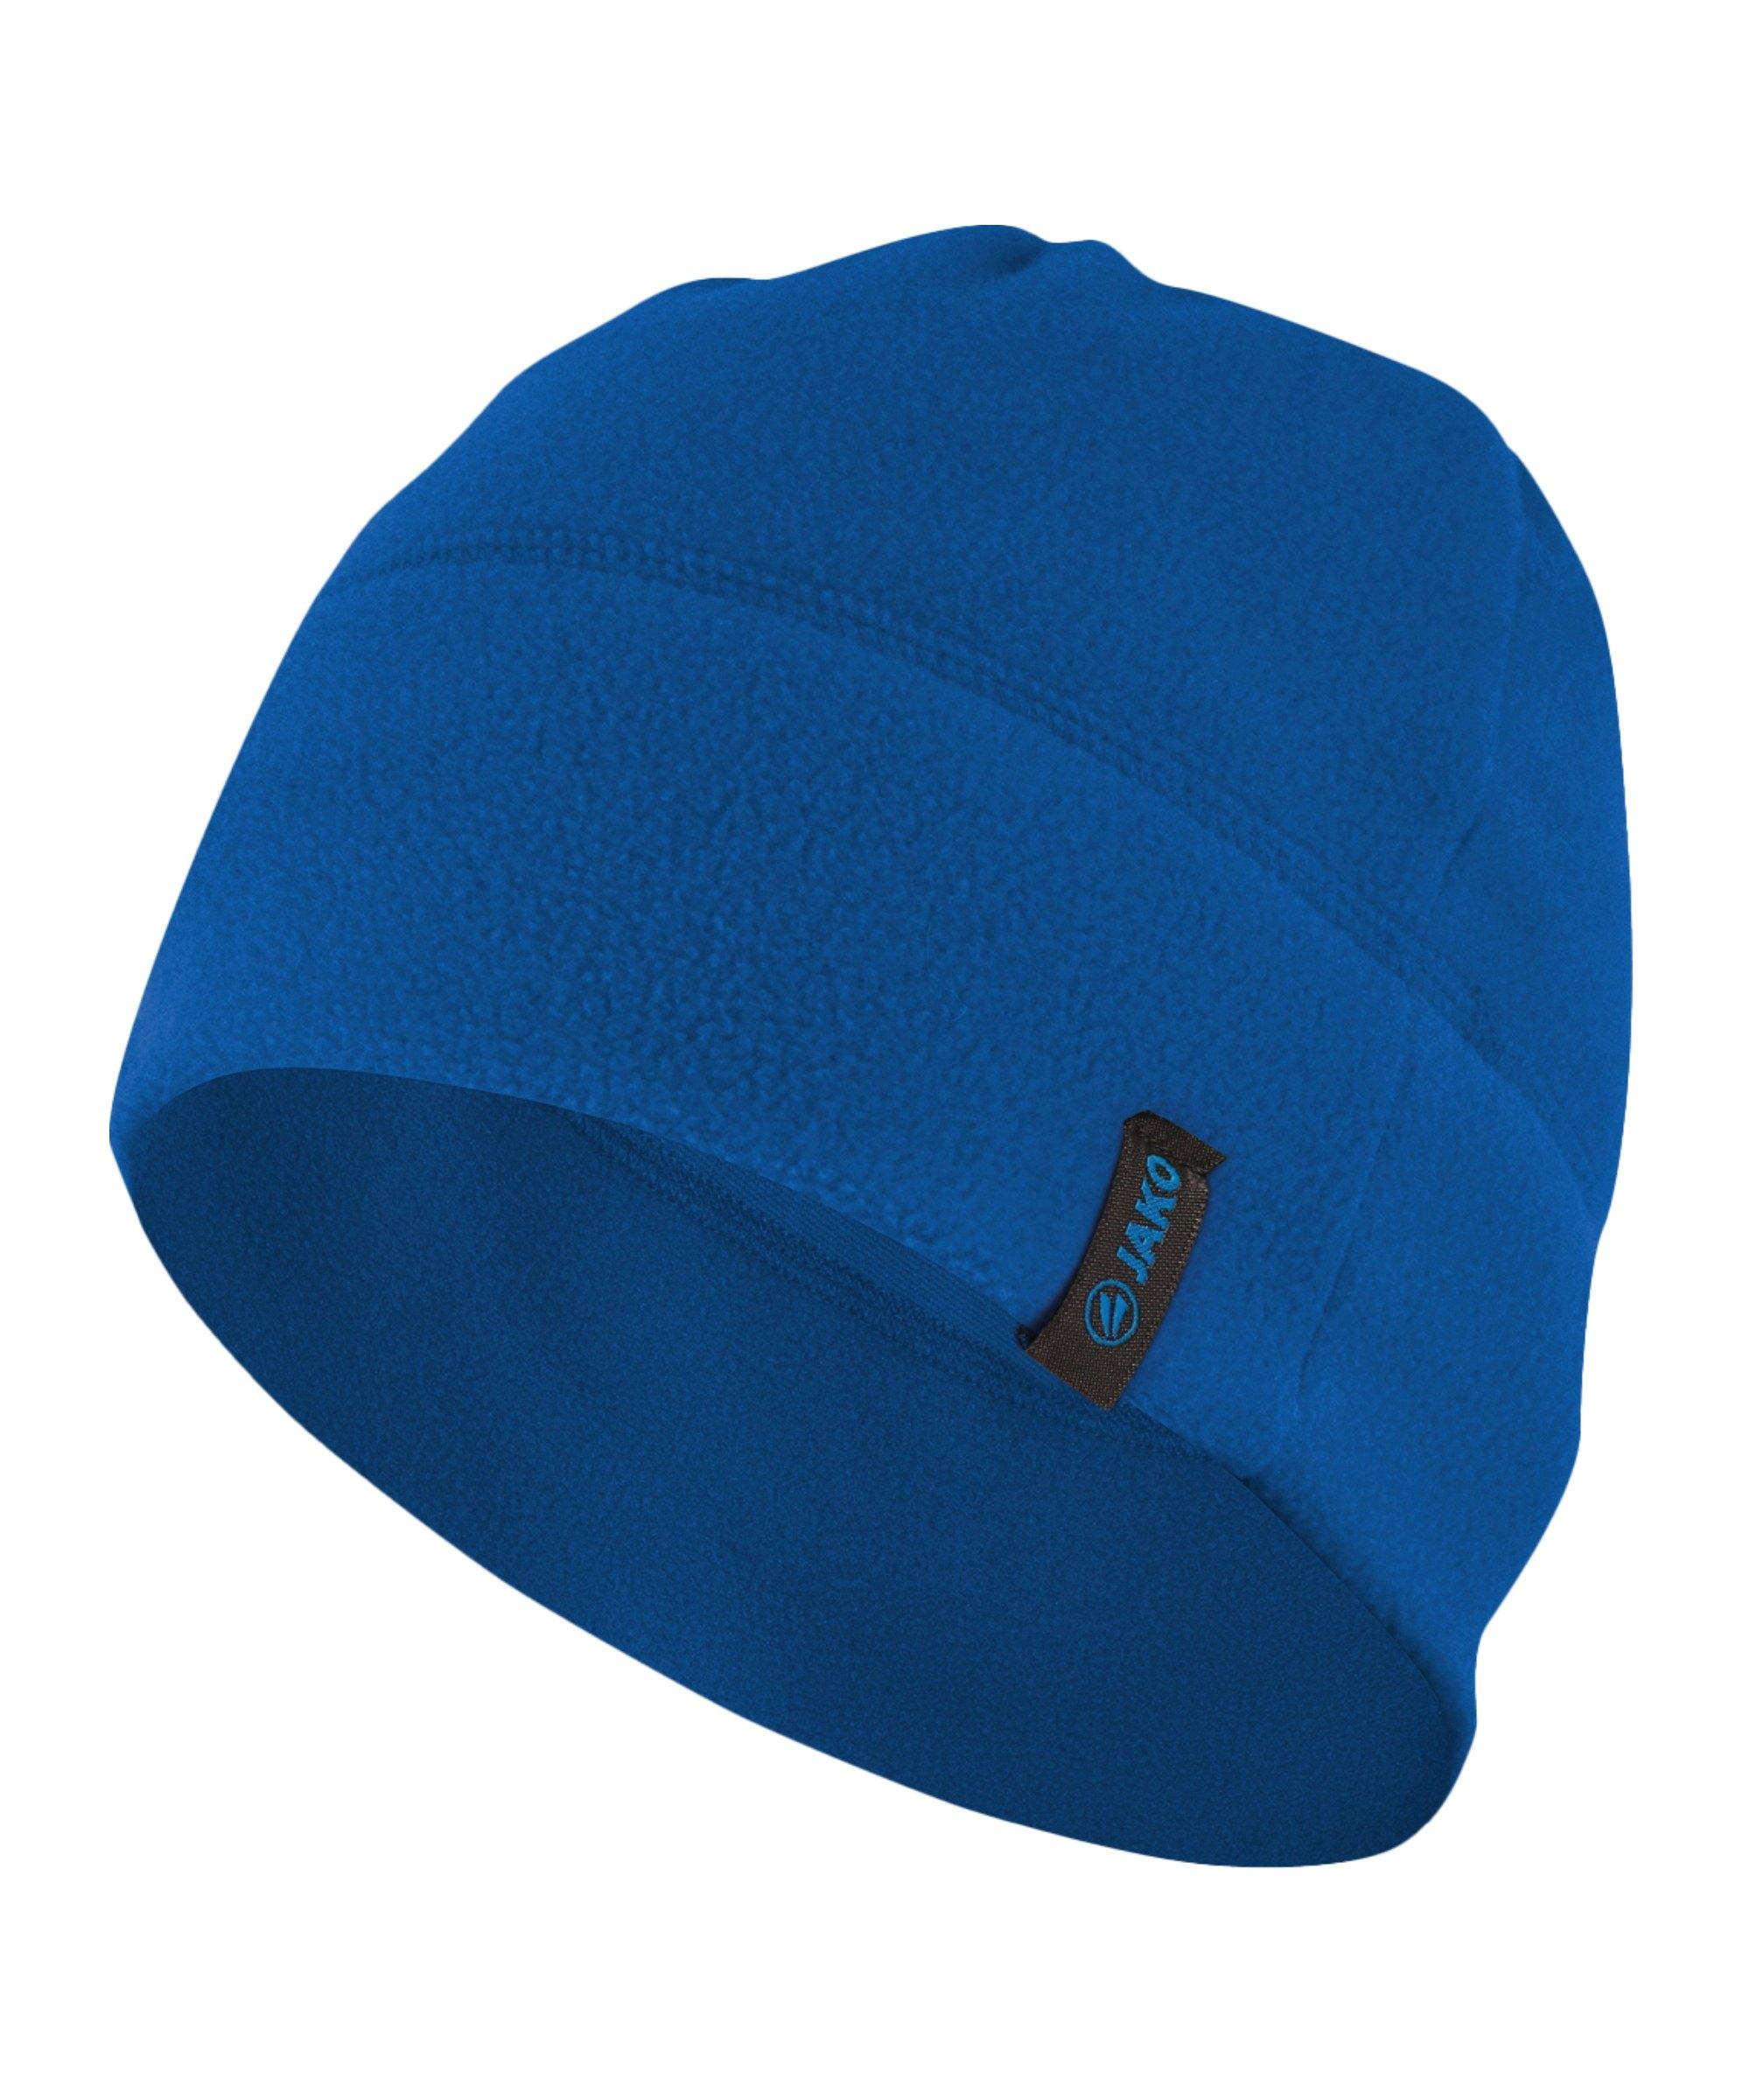 Jako Fleecemütze Blau F04 - blau